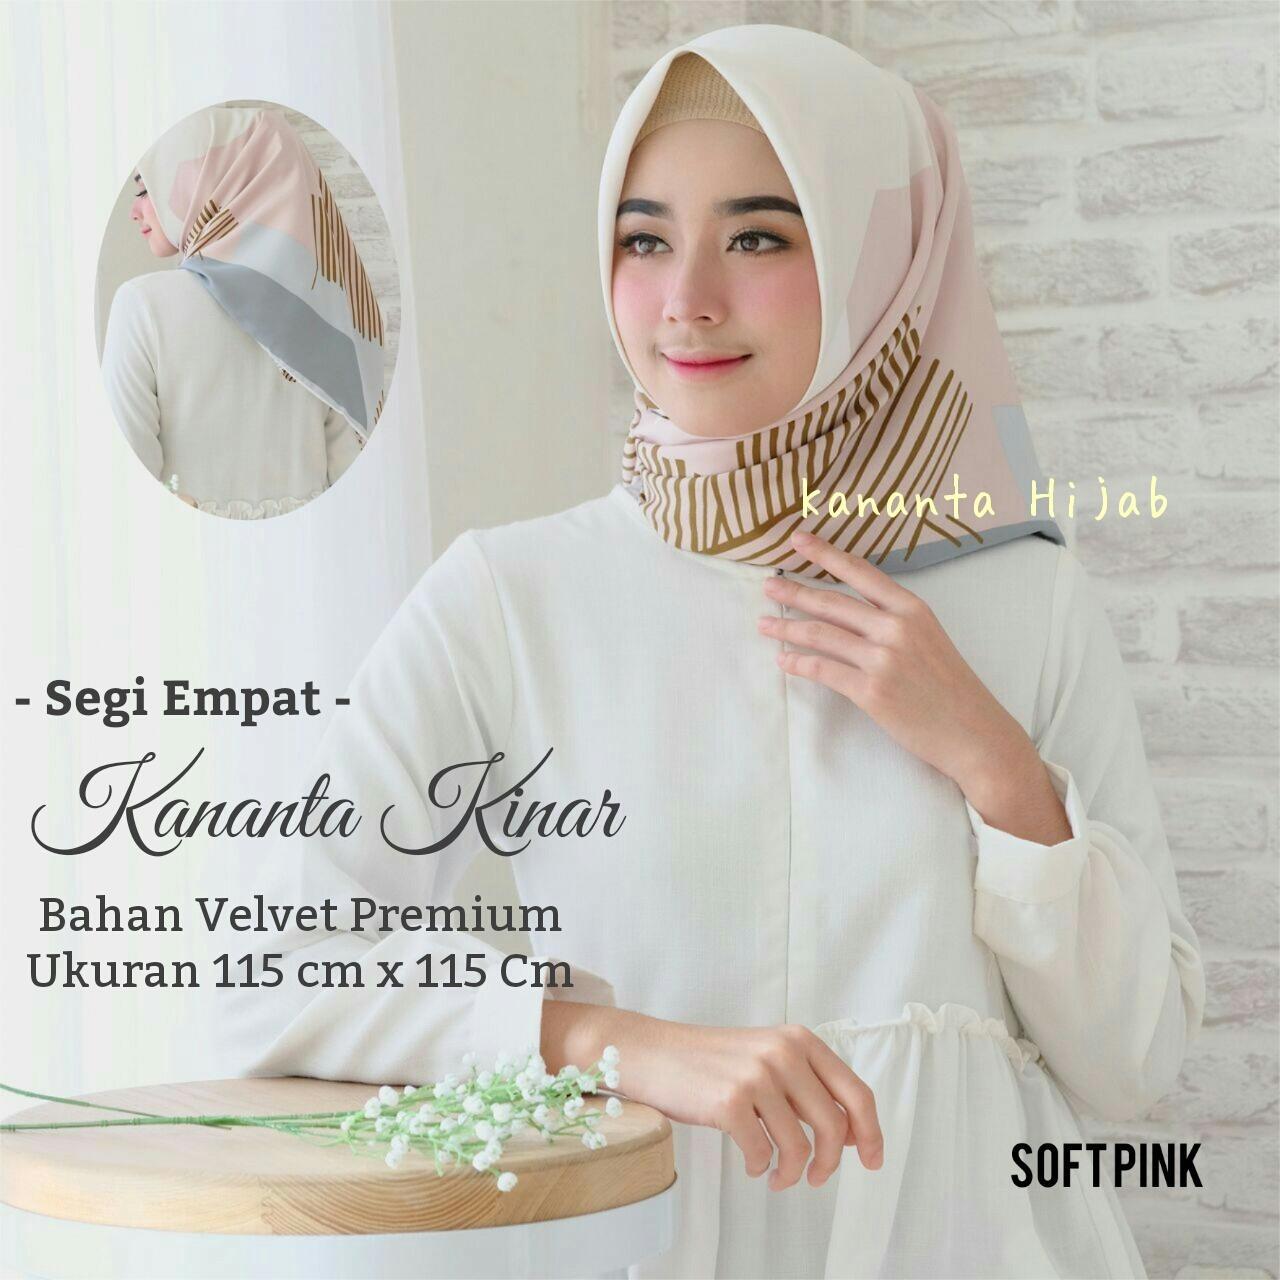 Beli Inner Bandana Rajut Ciput Dalaman Jilbab Anti Pusing Llinner Hijab Segi Empat Motif Abstrak Bahan Velvet Premium Maxmara Kananta Kinar